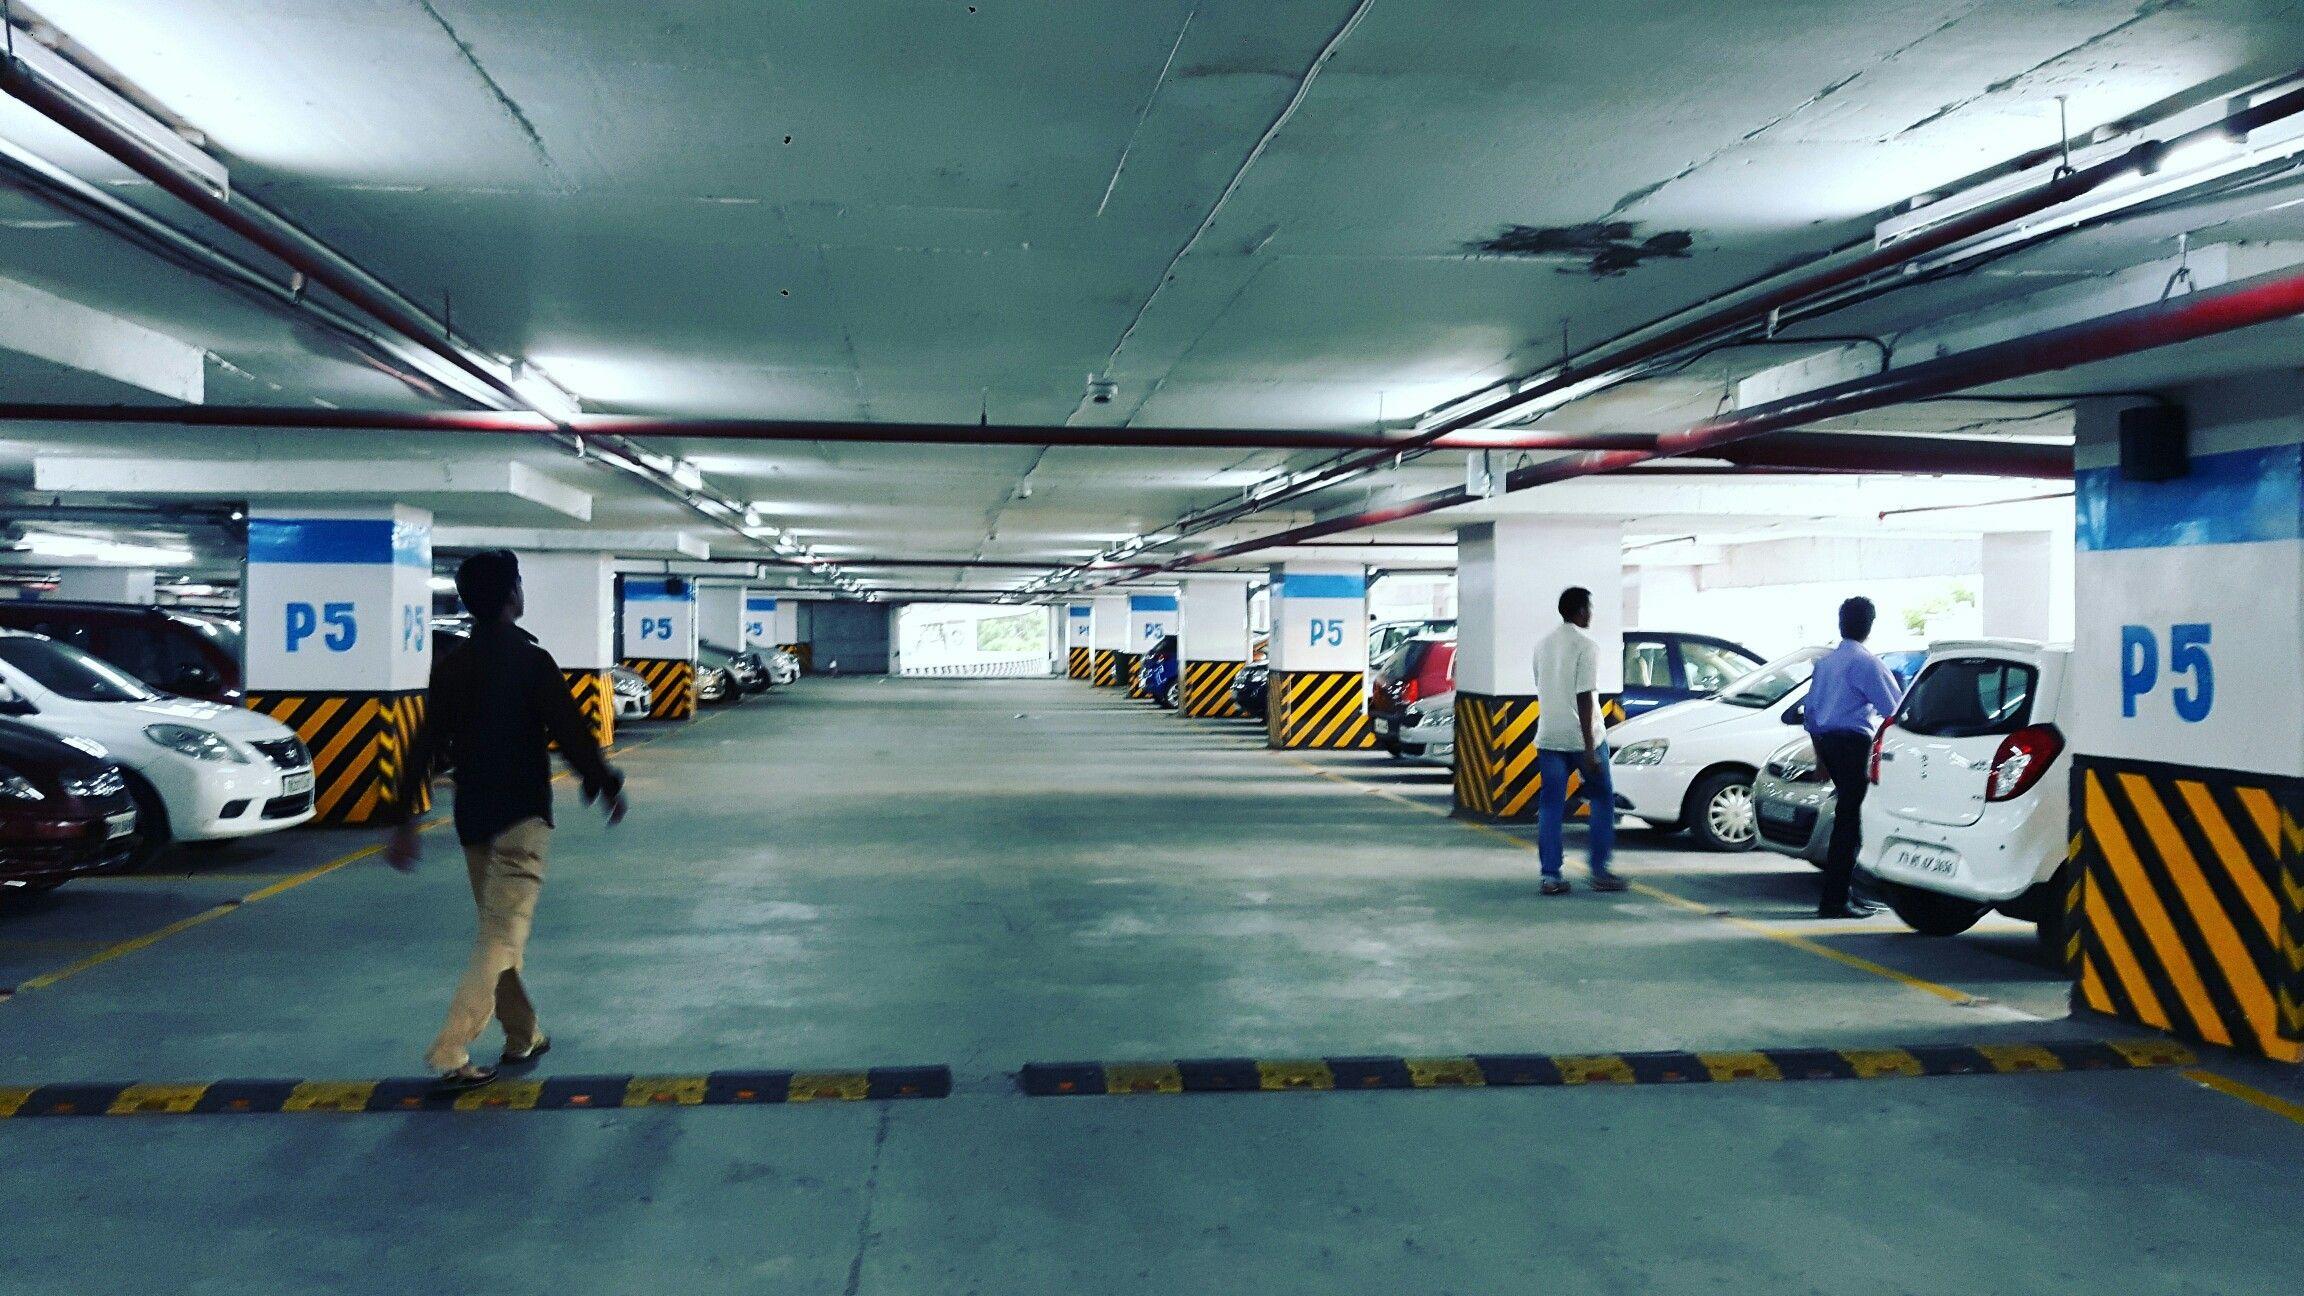 perspective #CarParking #phoenix #mall #architecture #velachery #tamilnadu #photography A8 #randomclicks #hap… | Architecture photography, Photography, Car parking